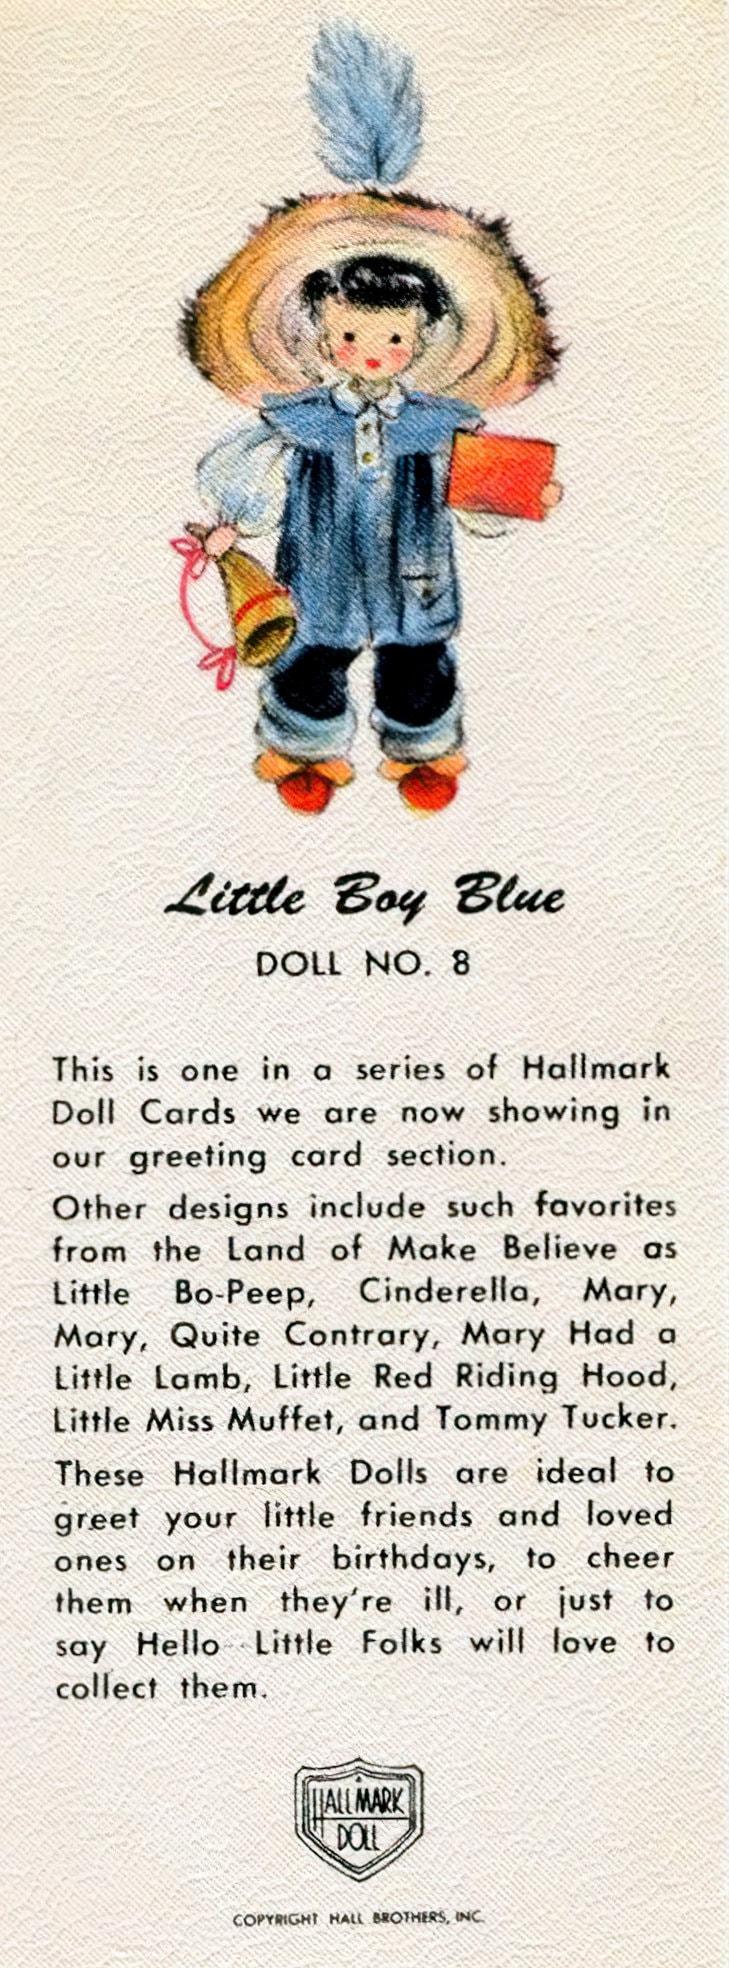 Vintage 1940s Hallmark Doll cards - Little Boy Blue